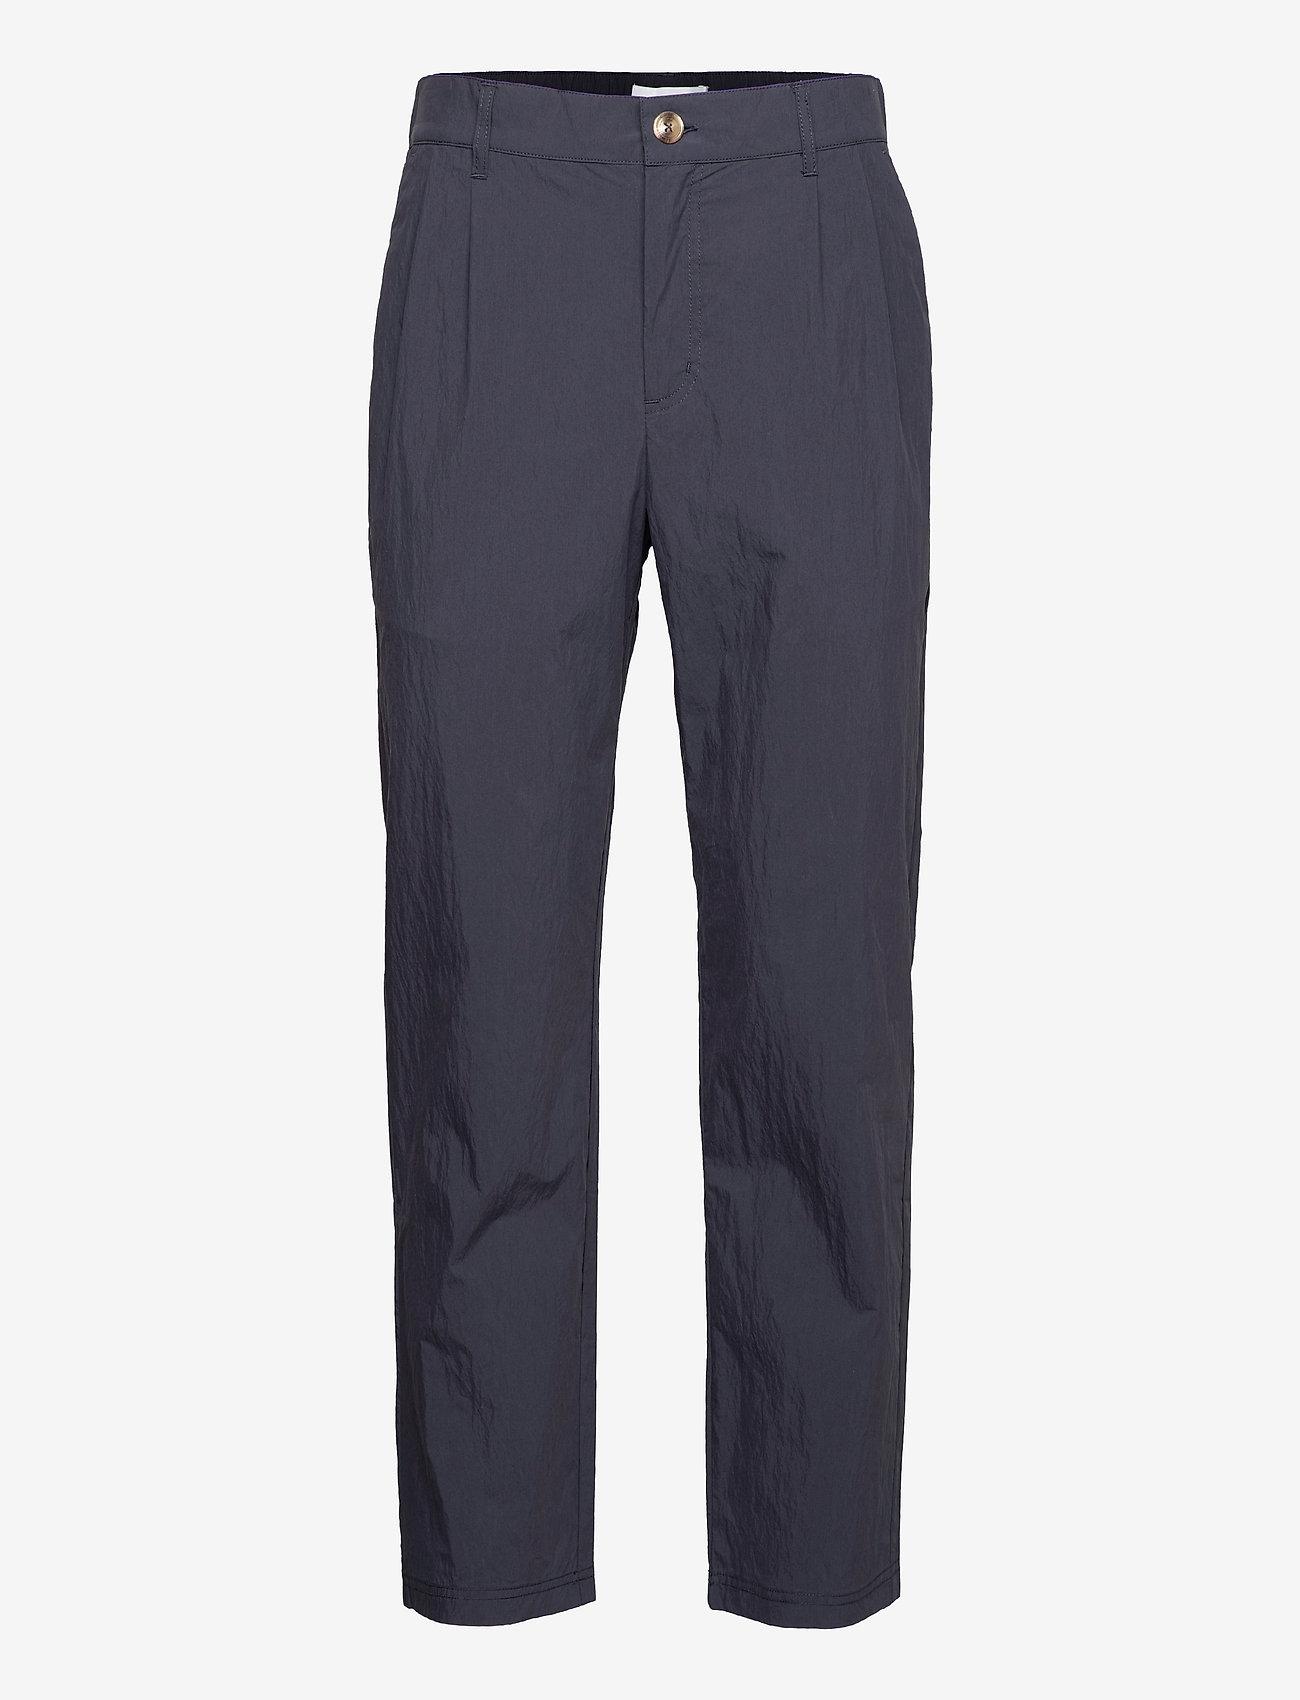 HAN Kjøbenhavn - Tapered Trousers - chino's - dusty navy - 0